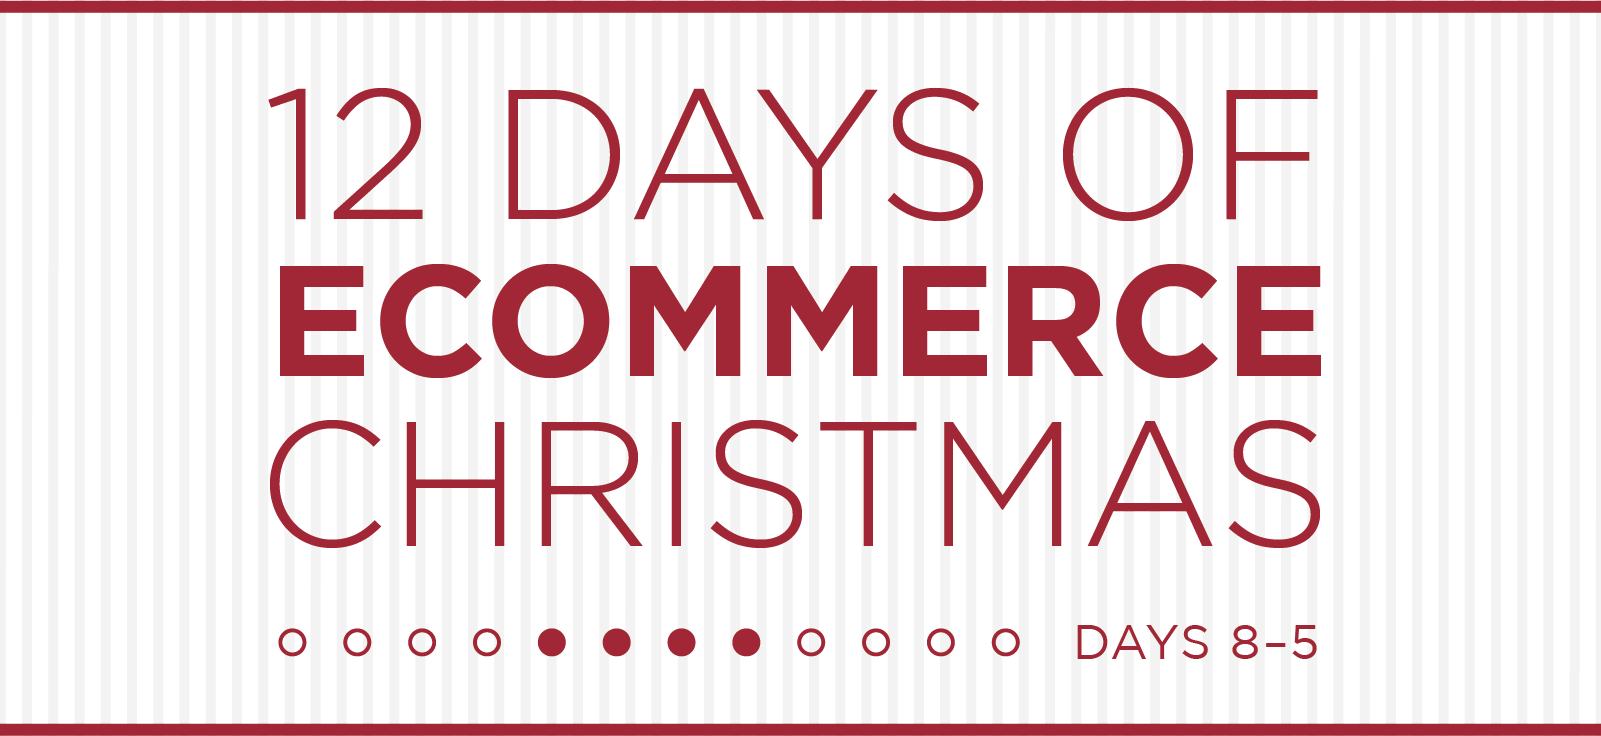 12-days-ecommerce-header-8-5